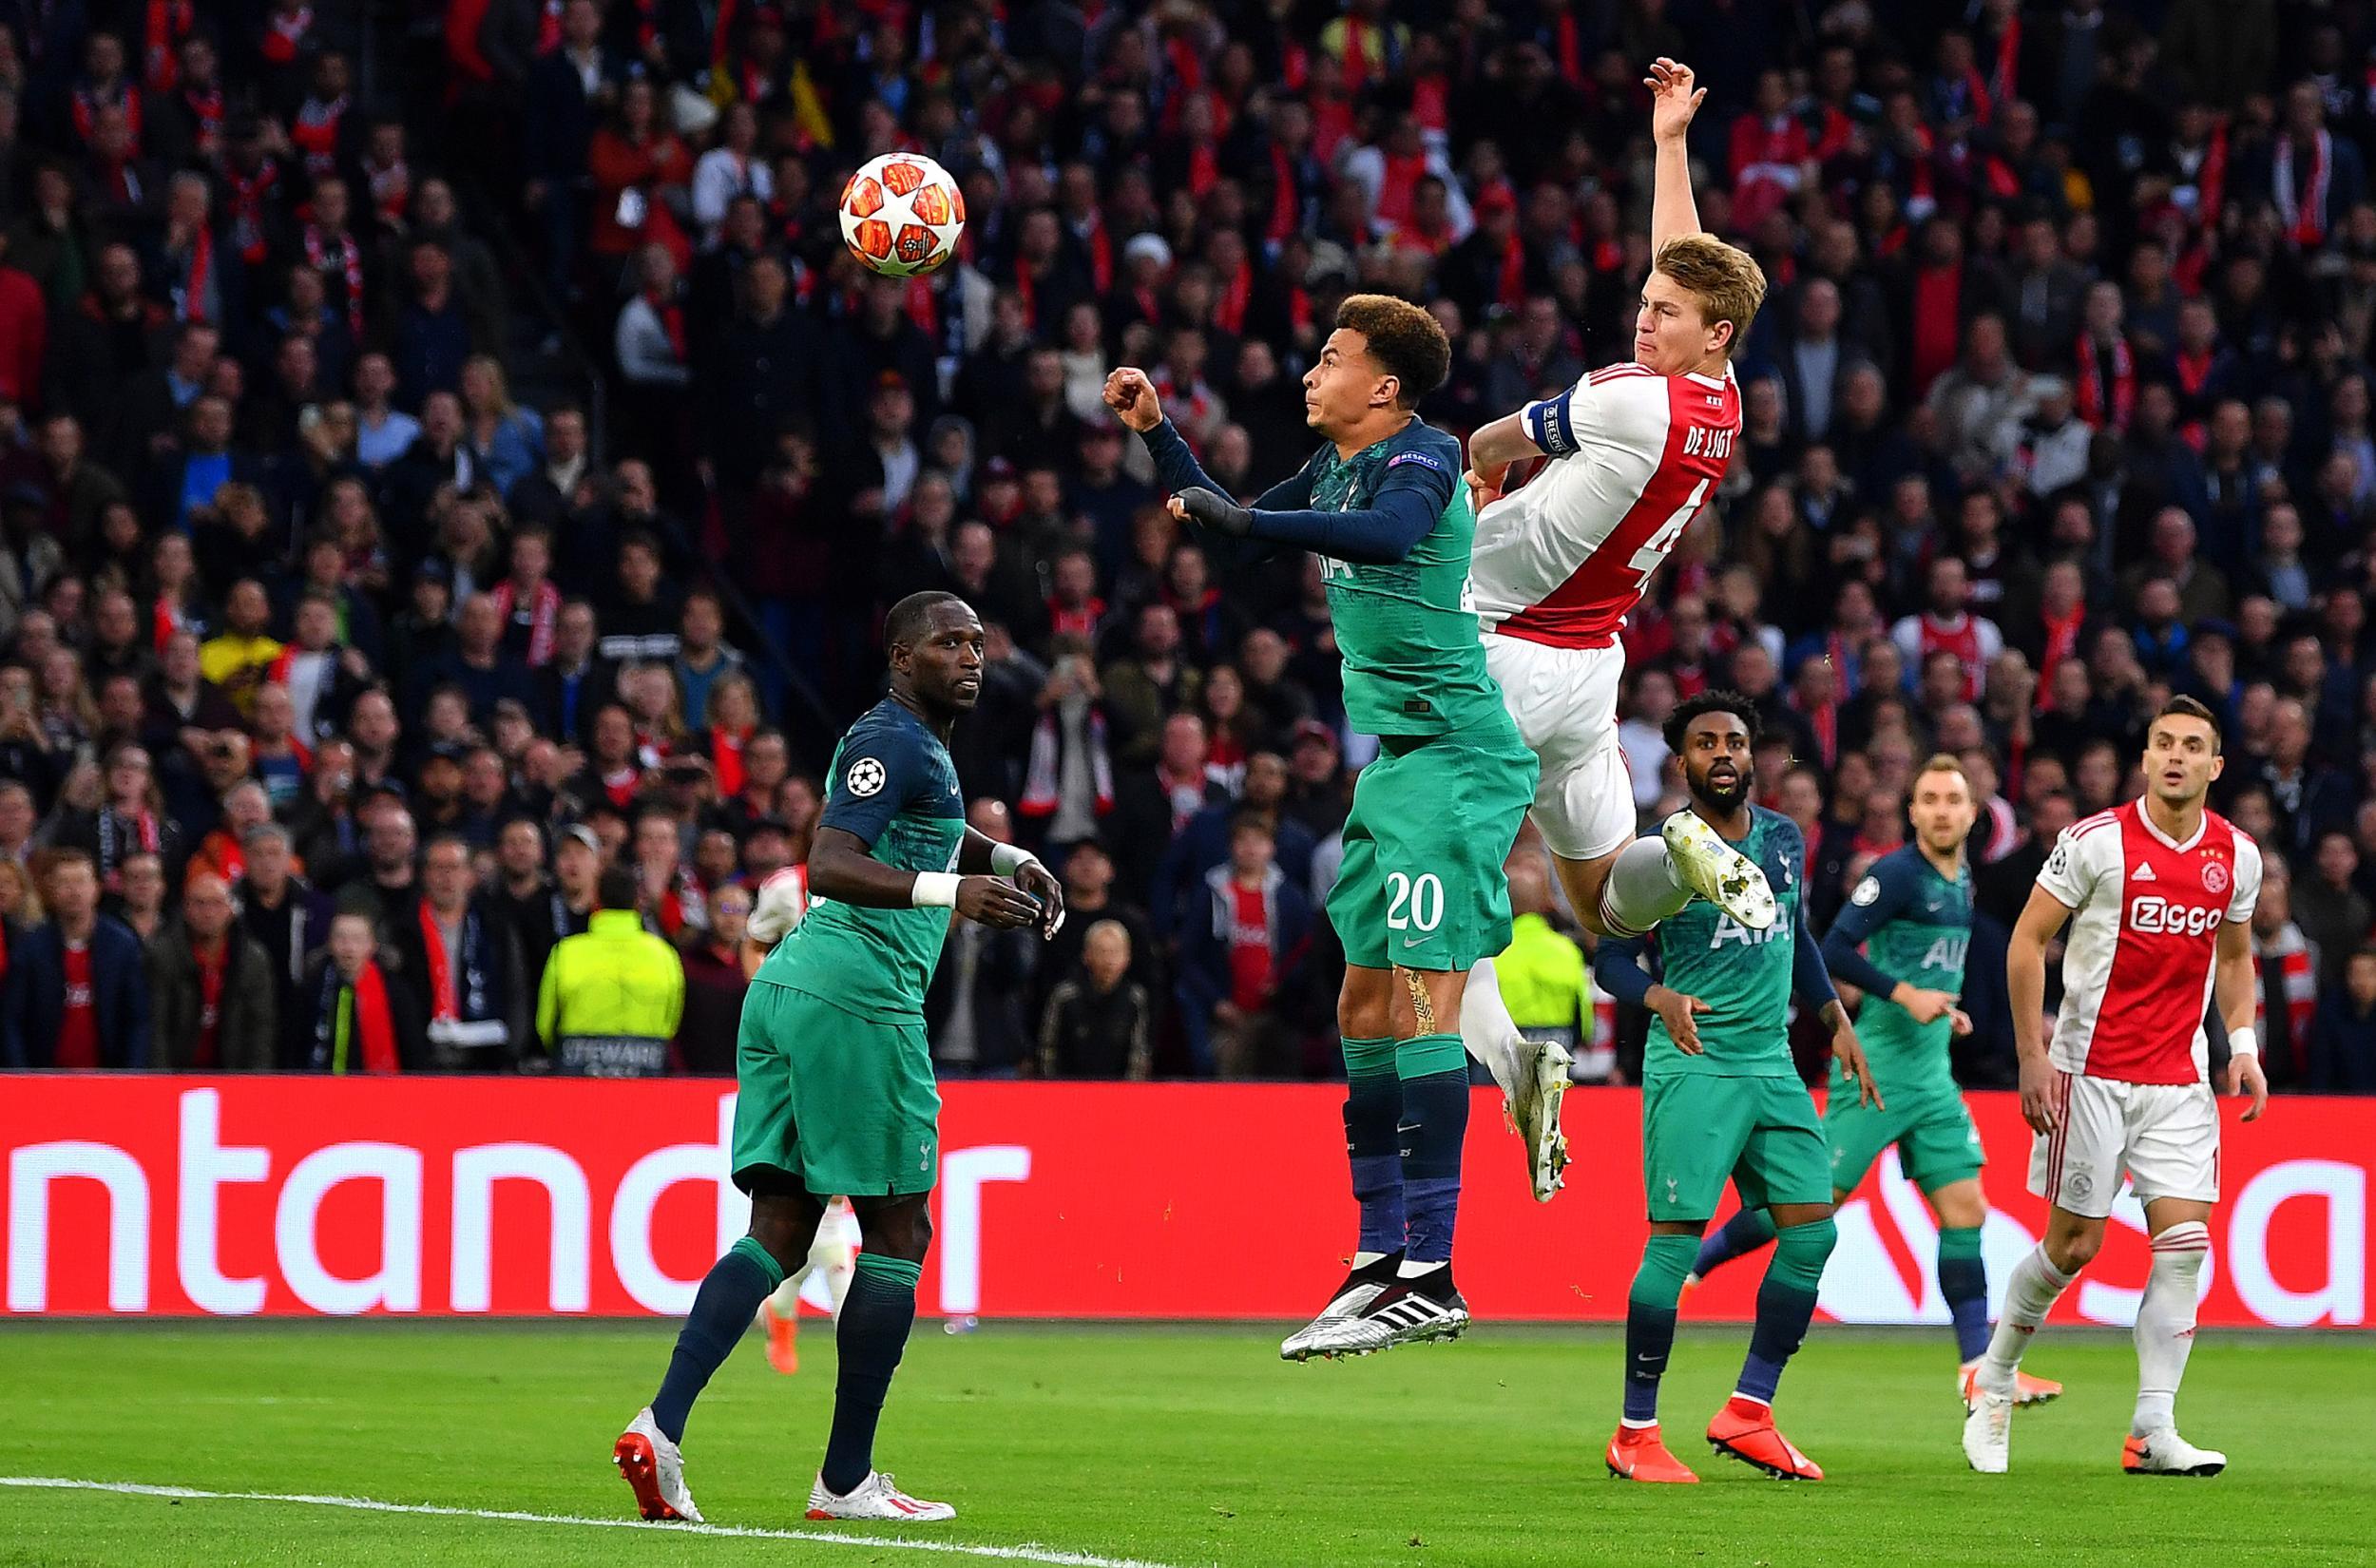 Matthijs De Ligt goal: Watch captain put Ajax in control against Tottenham in Champions League semi-final